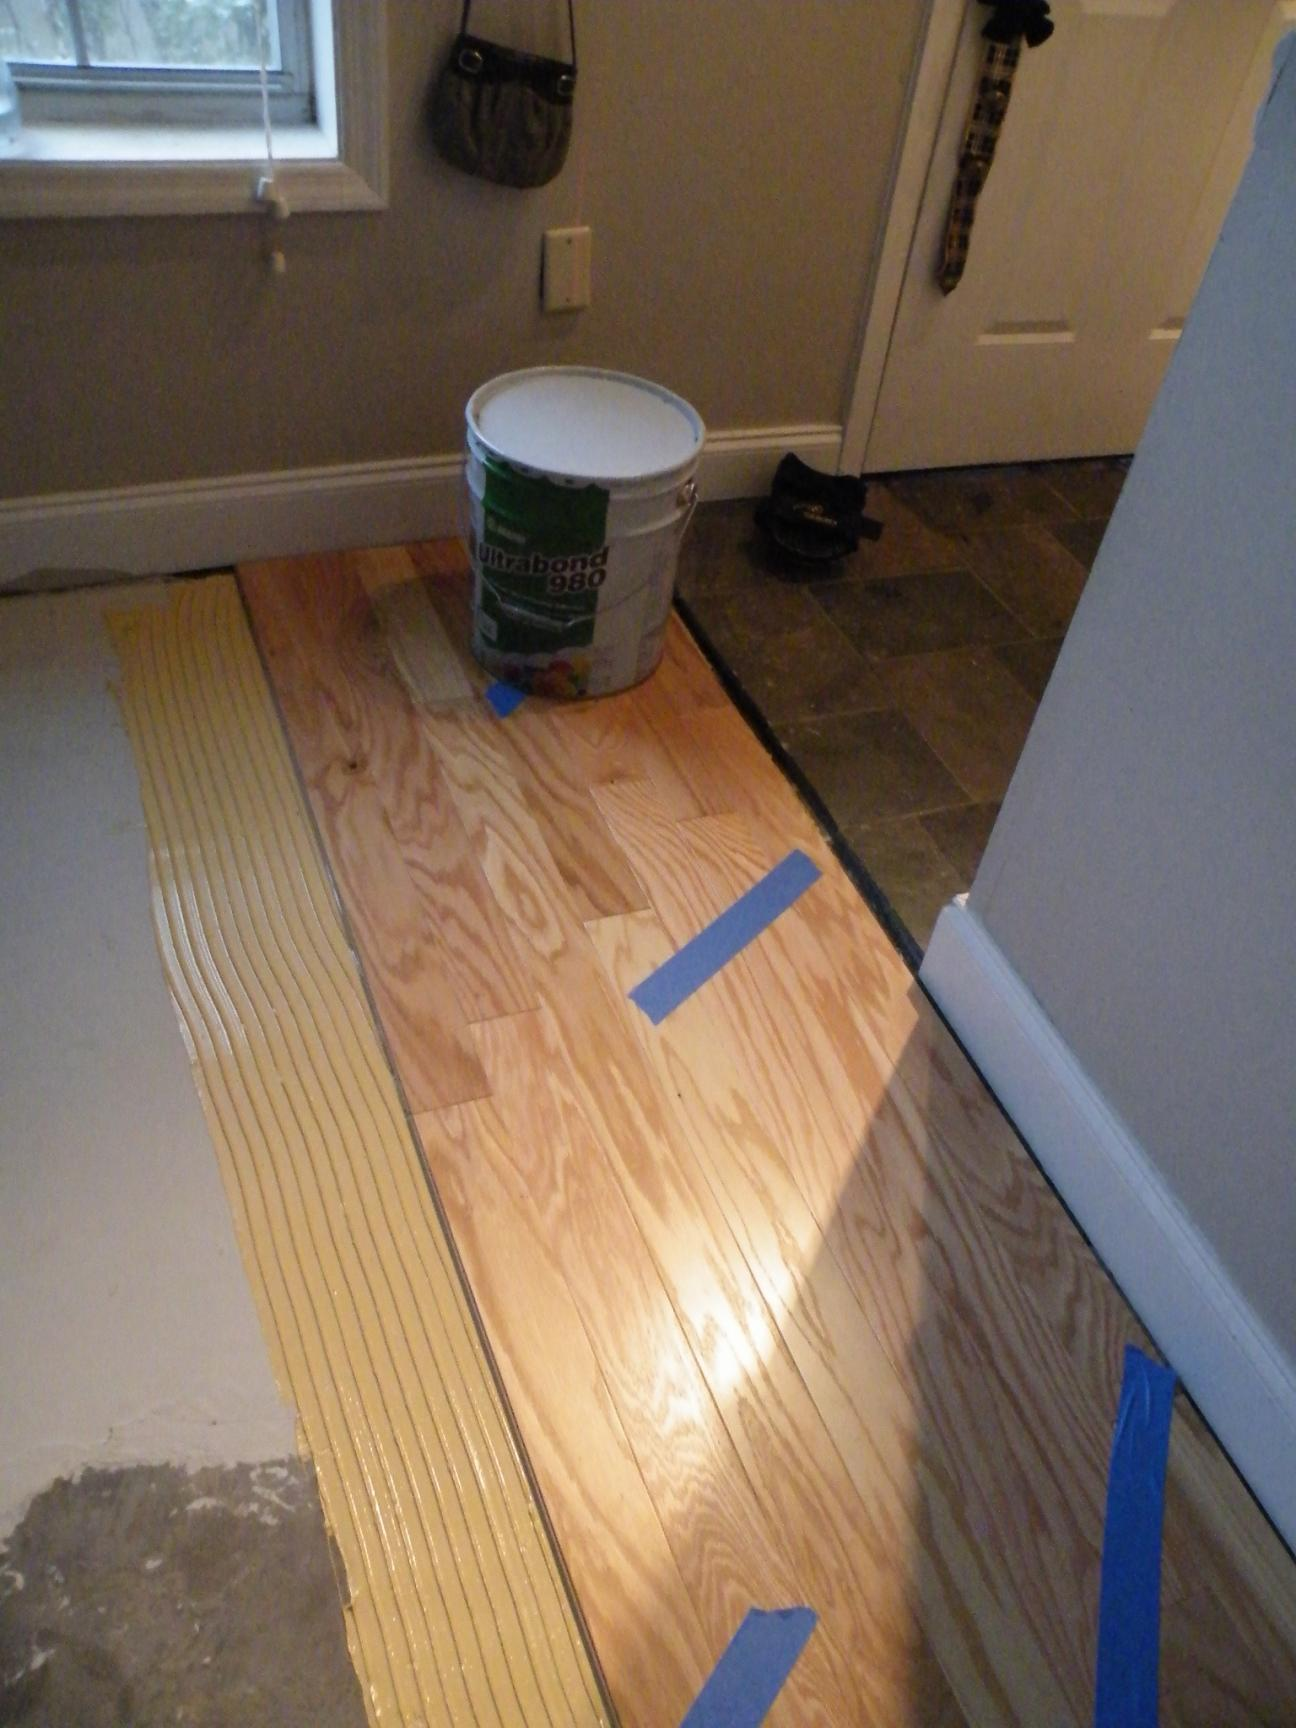 Tiling unlevel floor